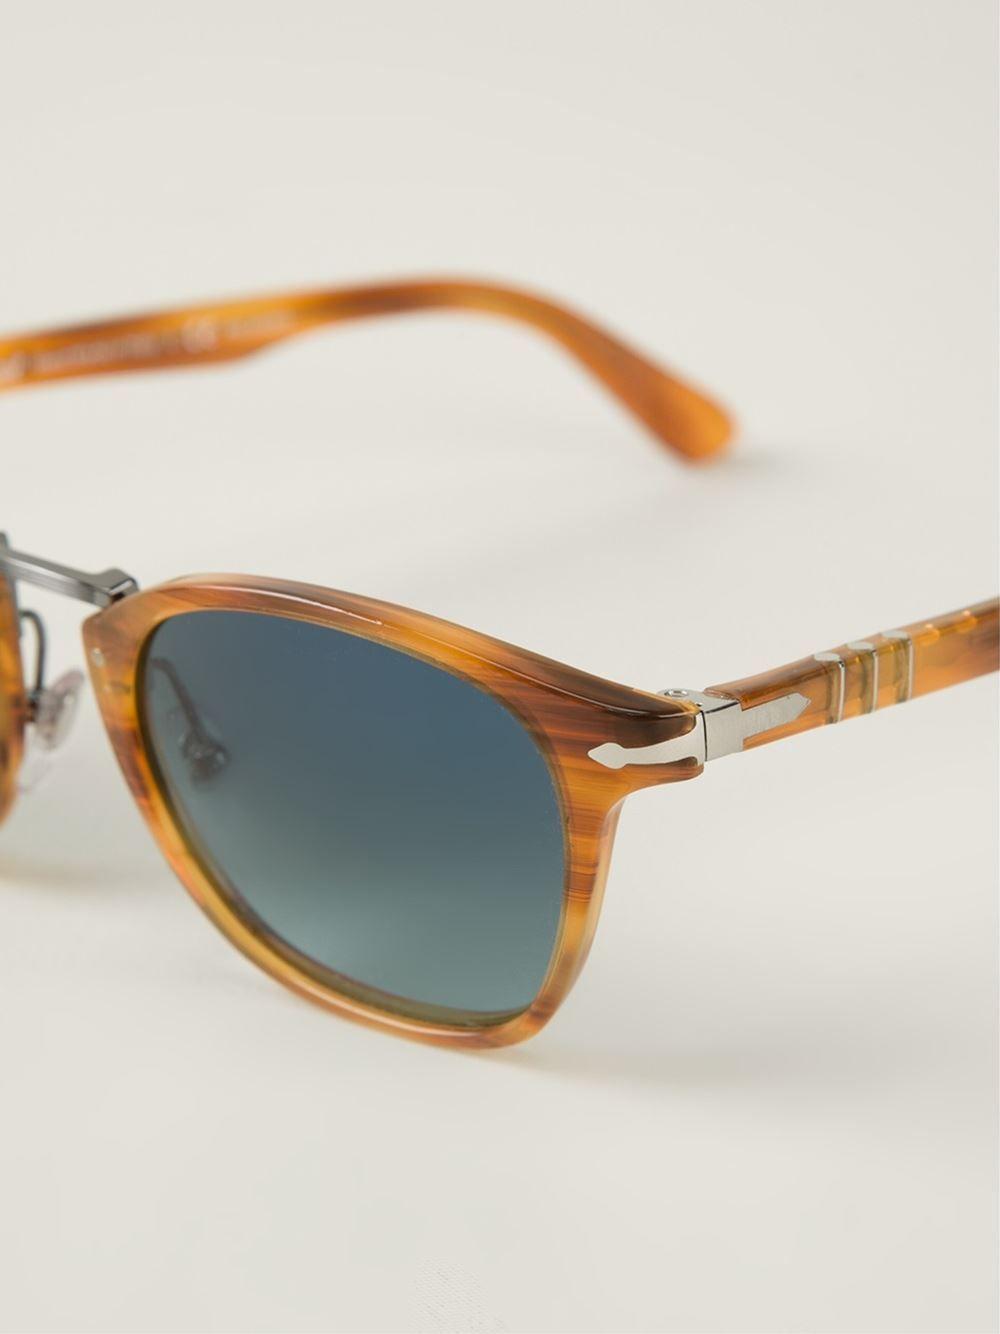 1c172bbf5fc97 PERSOL Rectangular-shaped Sunglasses